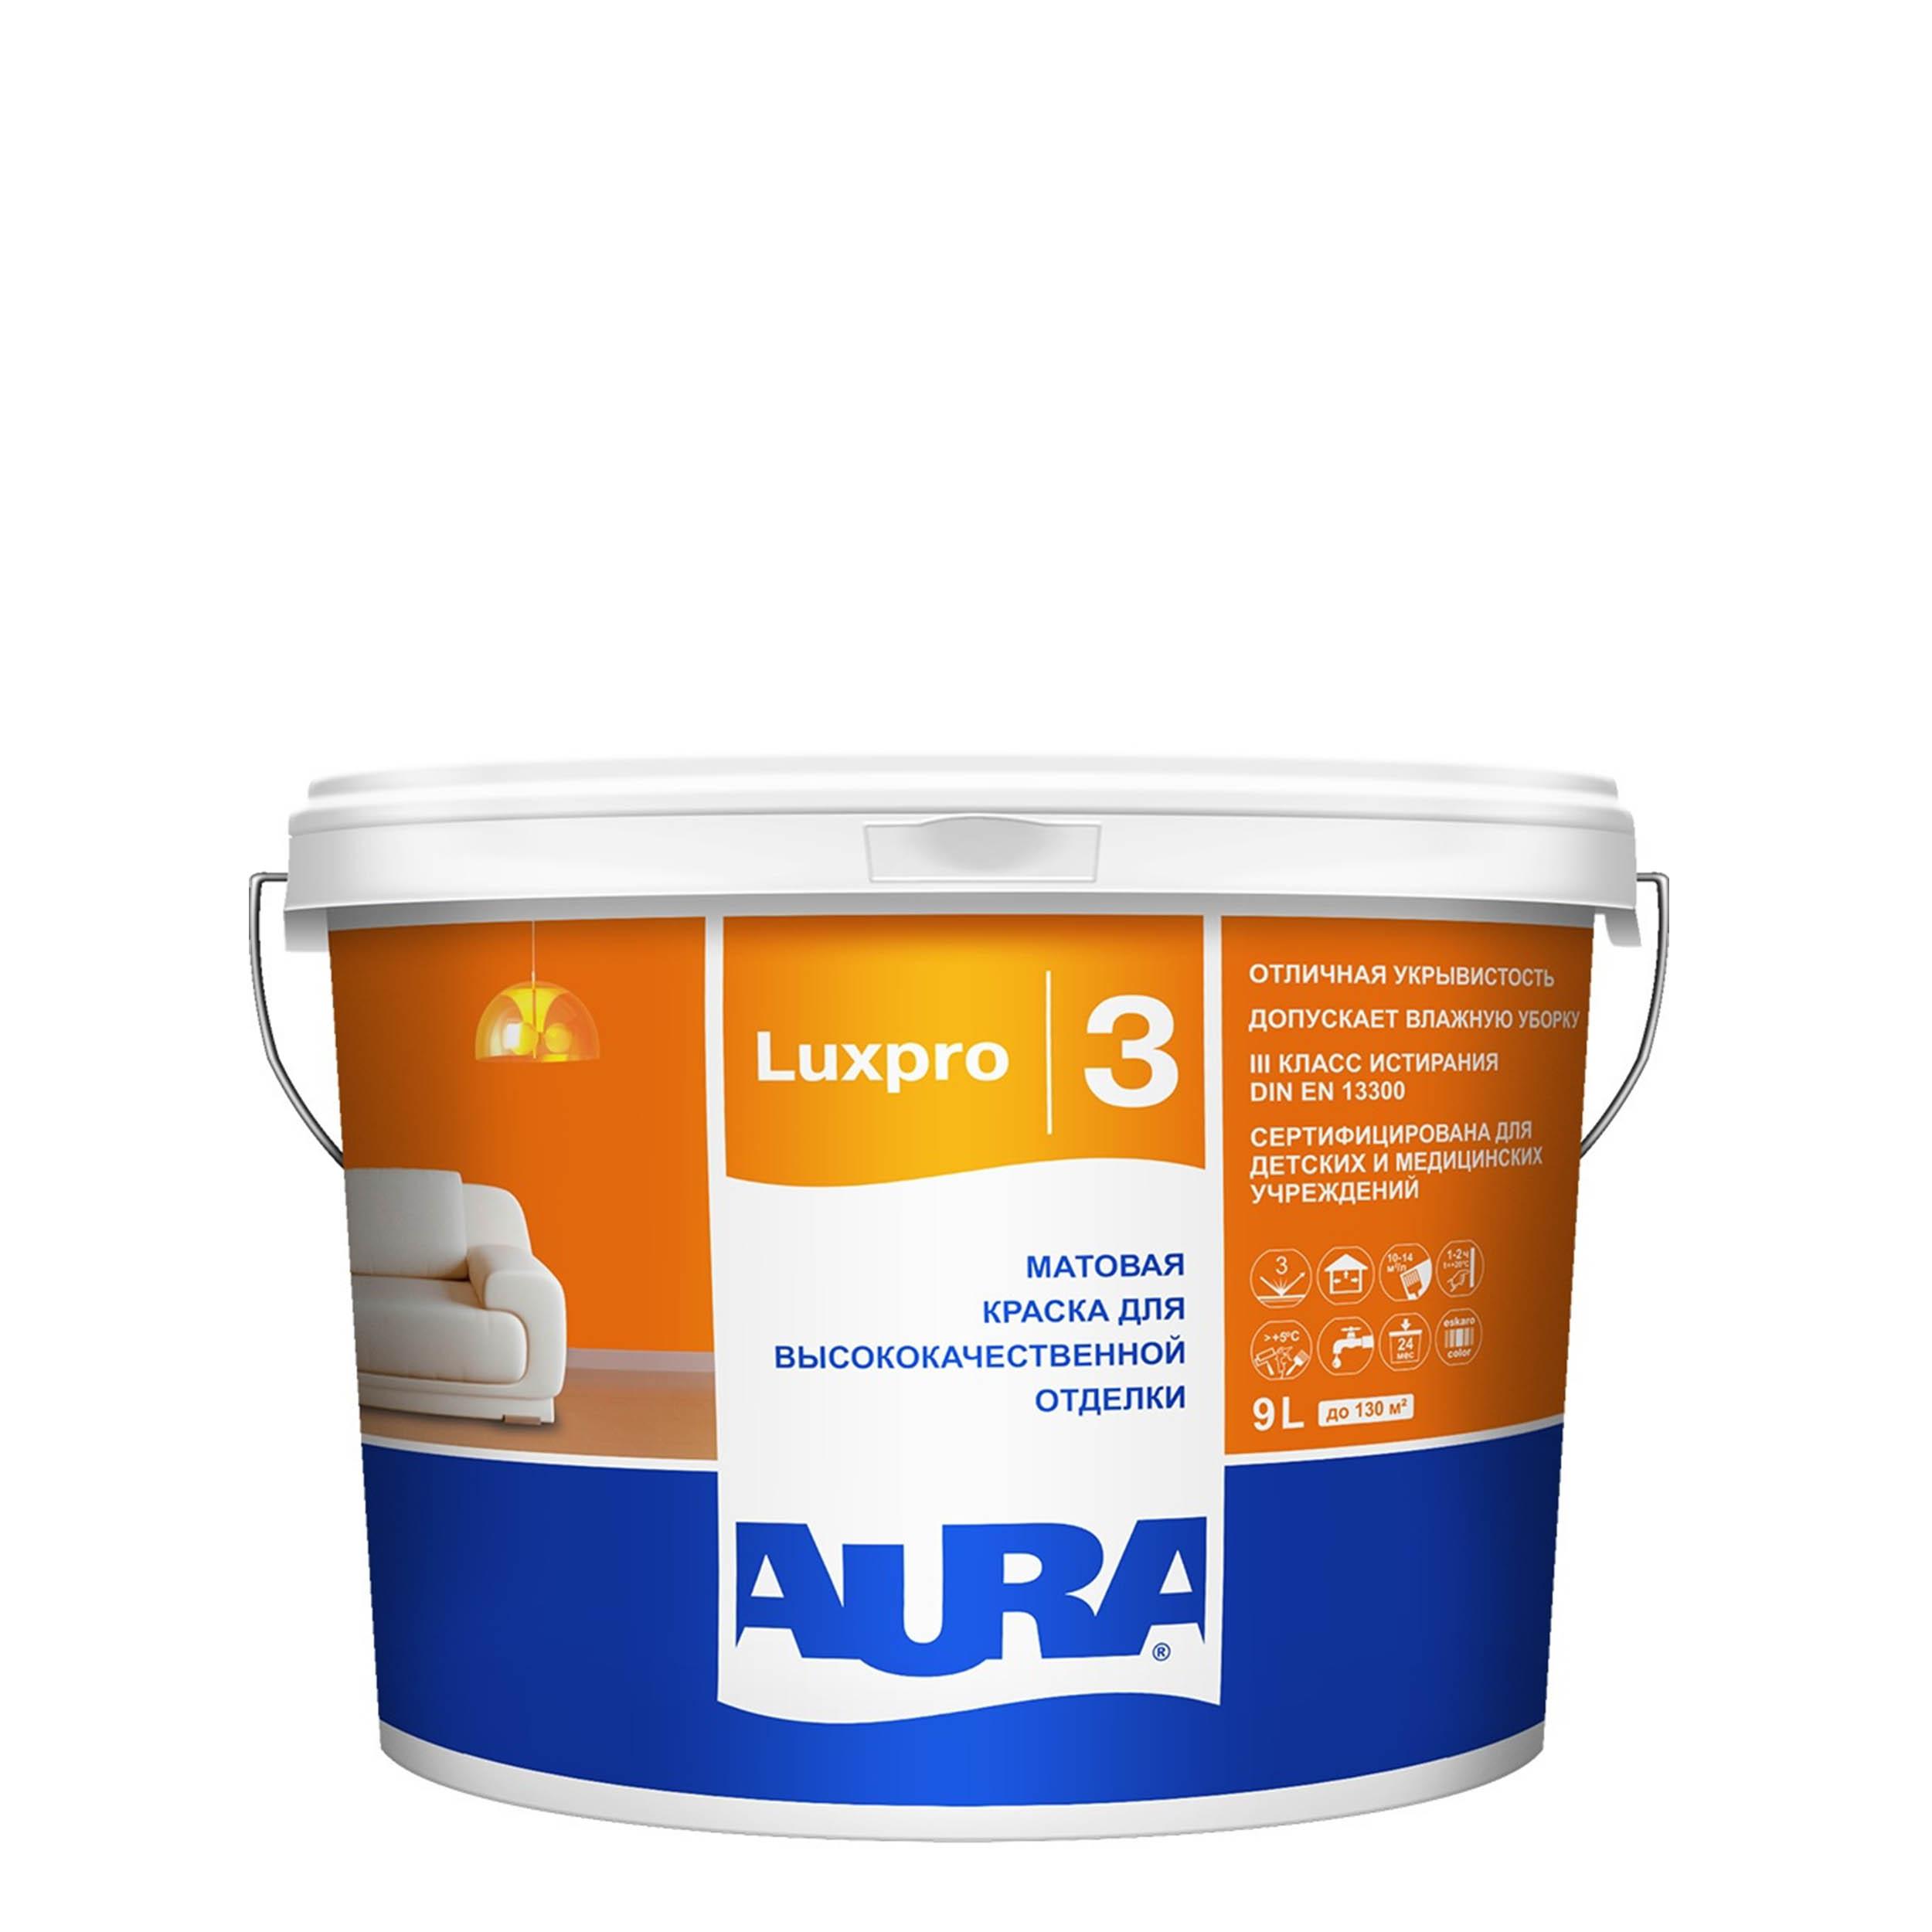 Фото 4 - Краска интерьерная, Aura LuxPRO 3, RAL 3027, 11 кг.